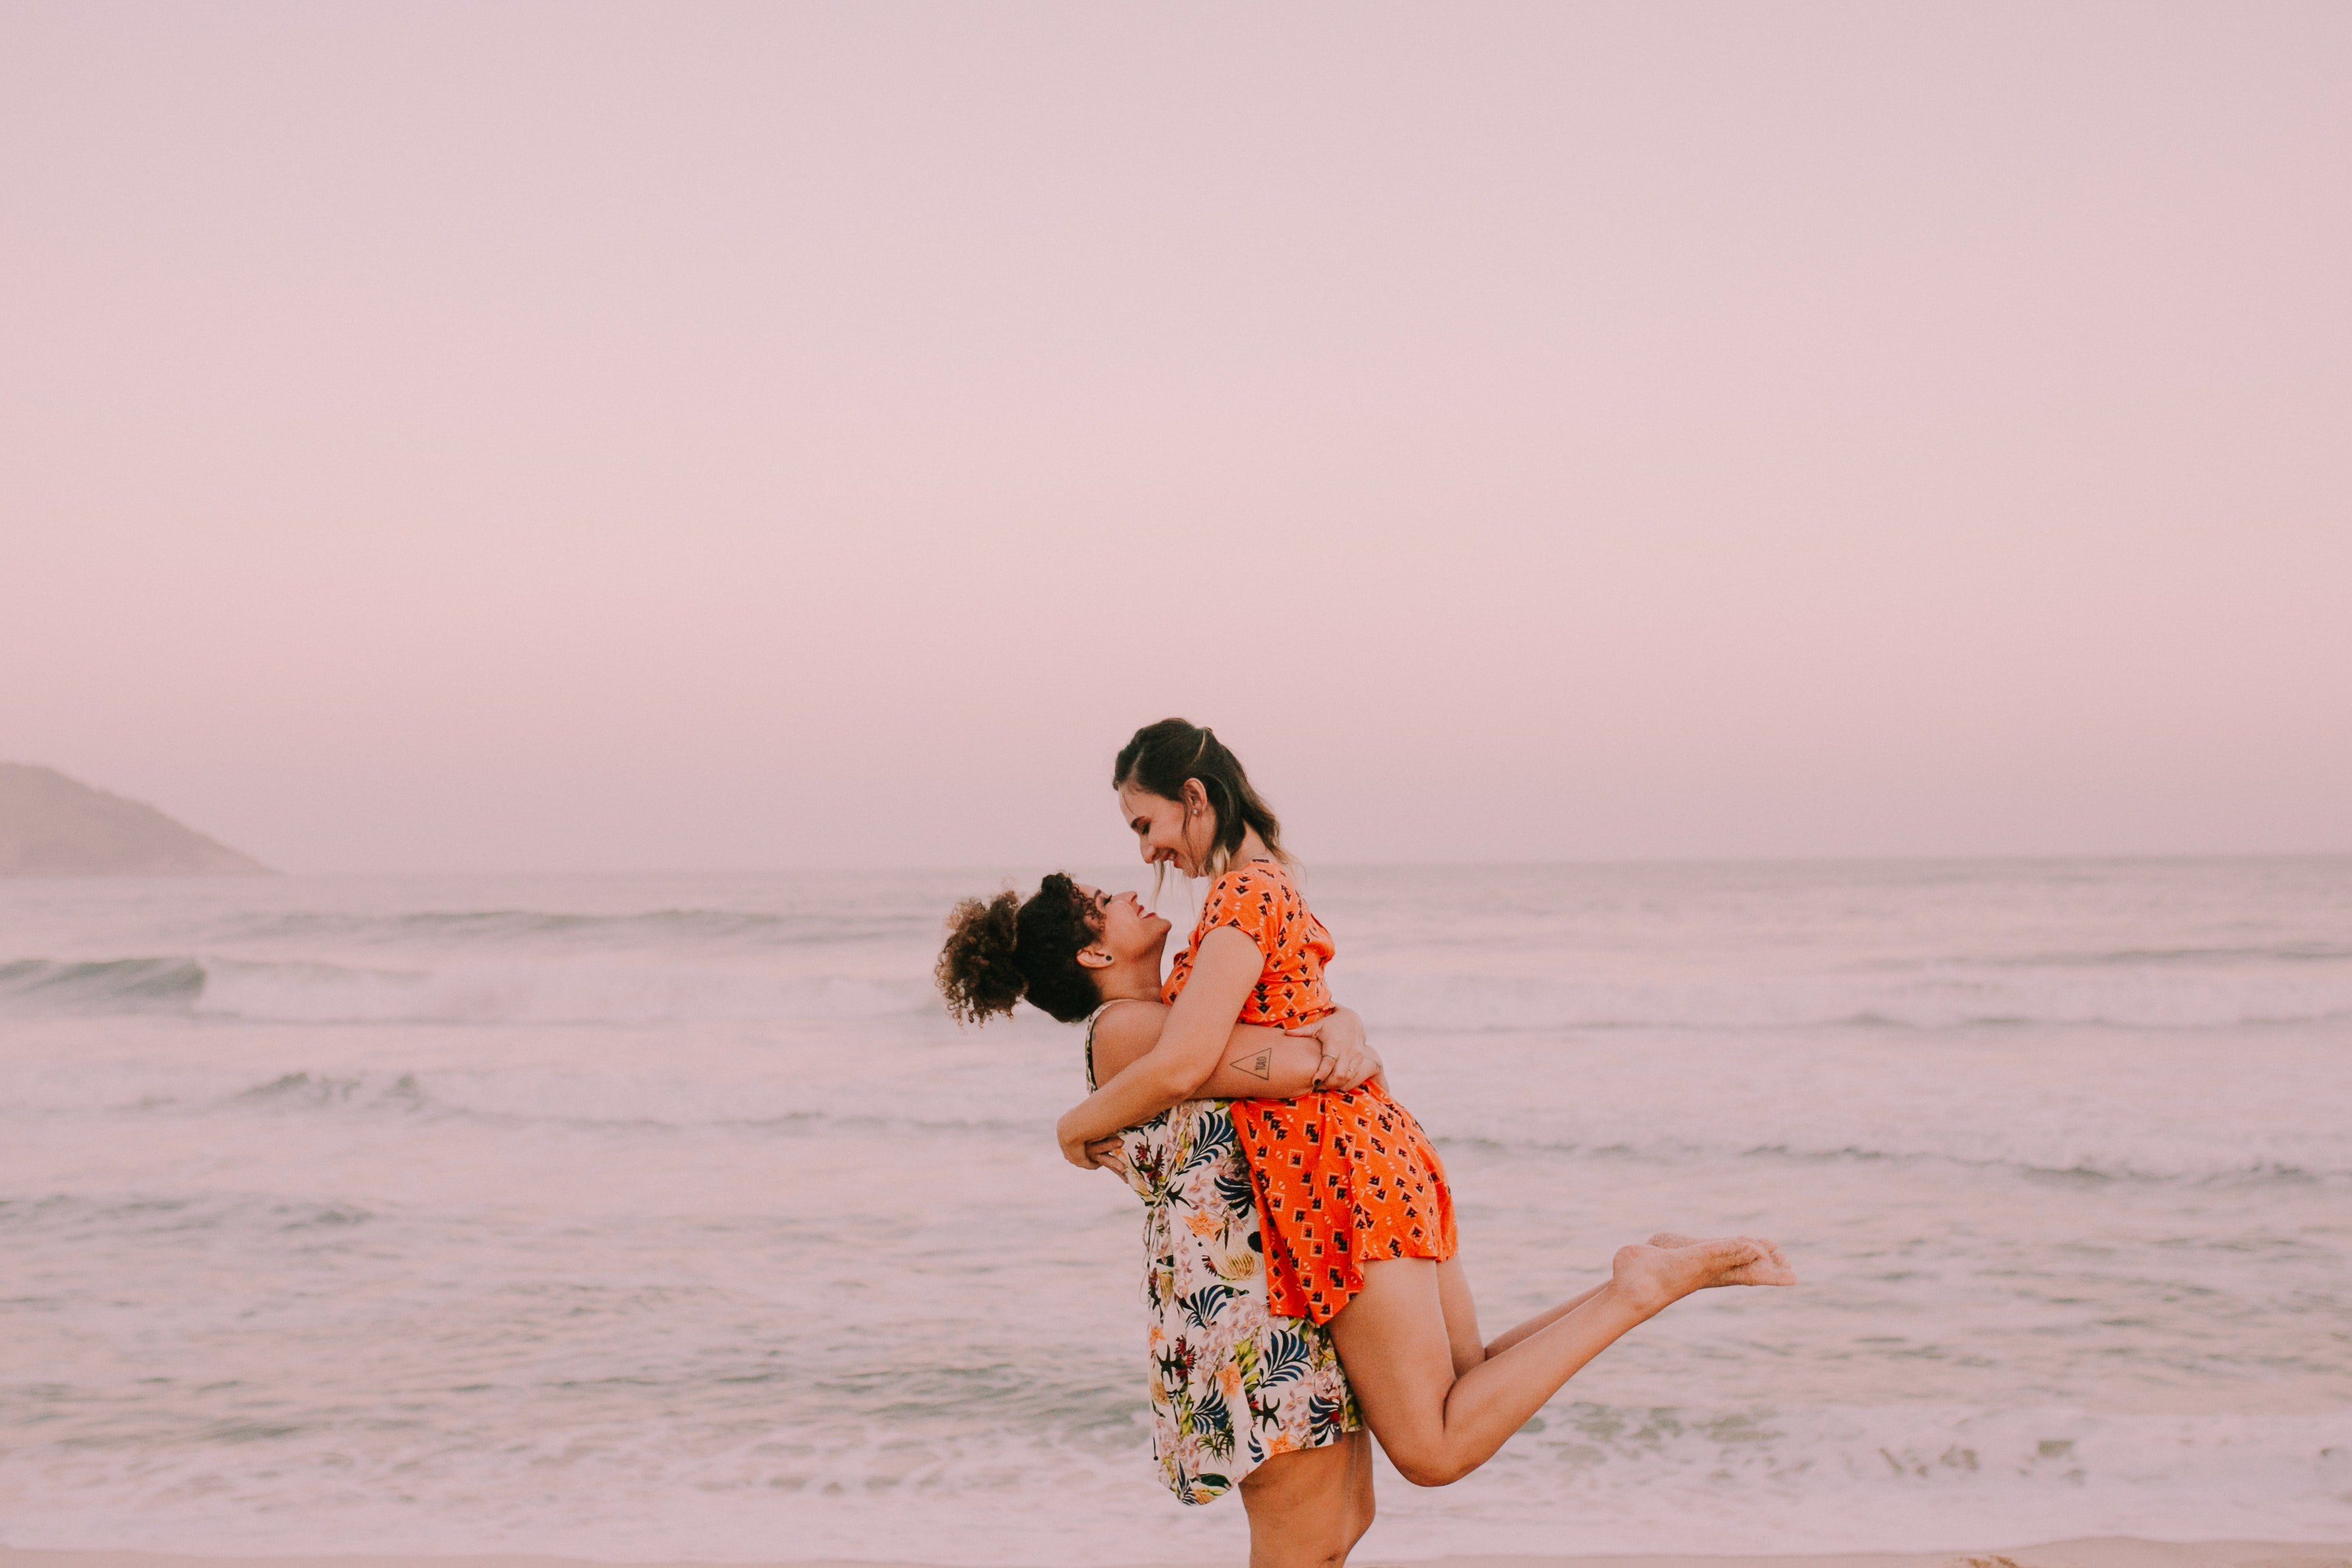 5 Incredible Real-Life Love Stories